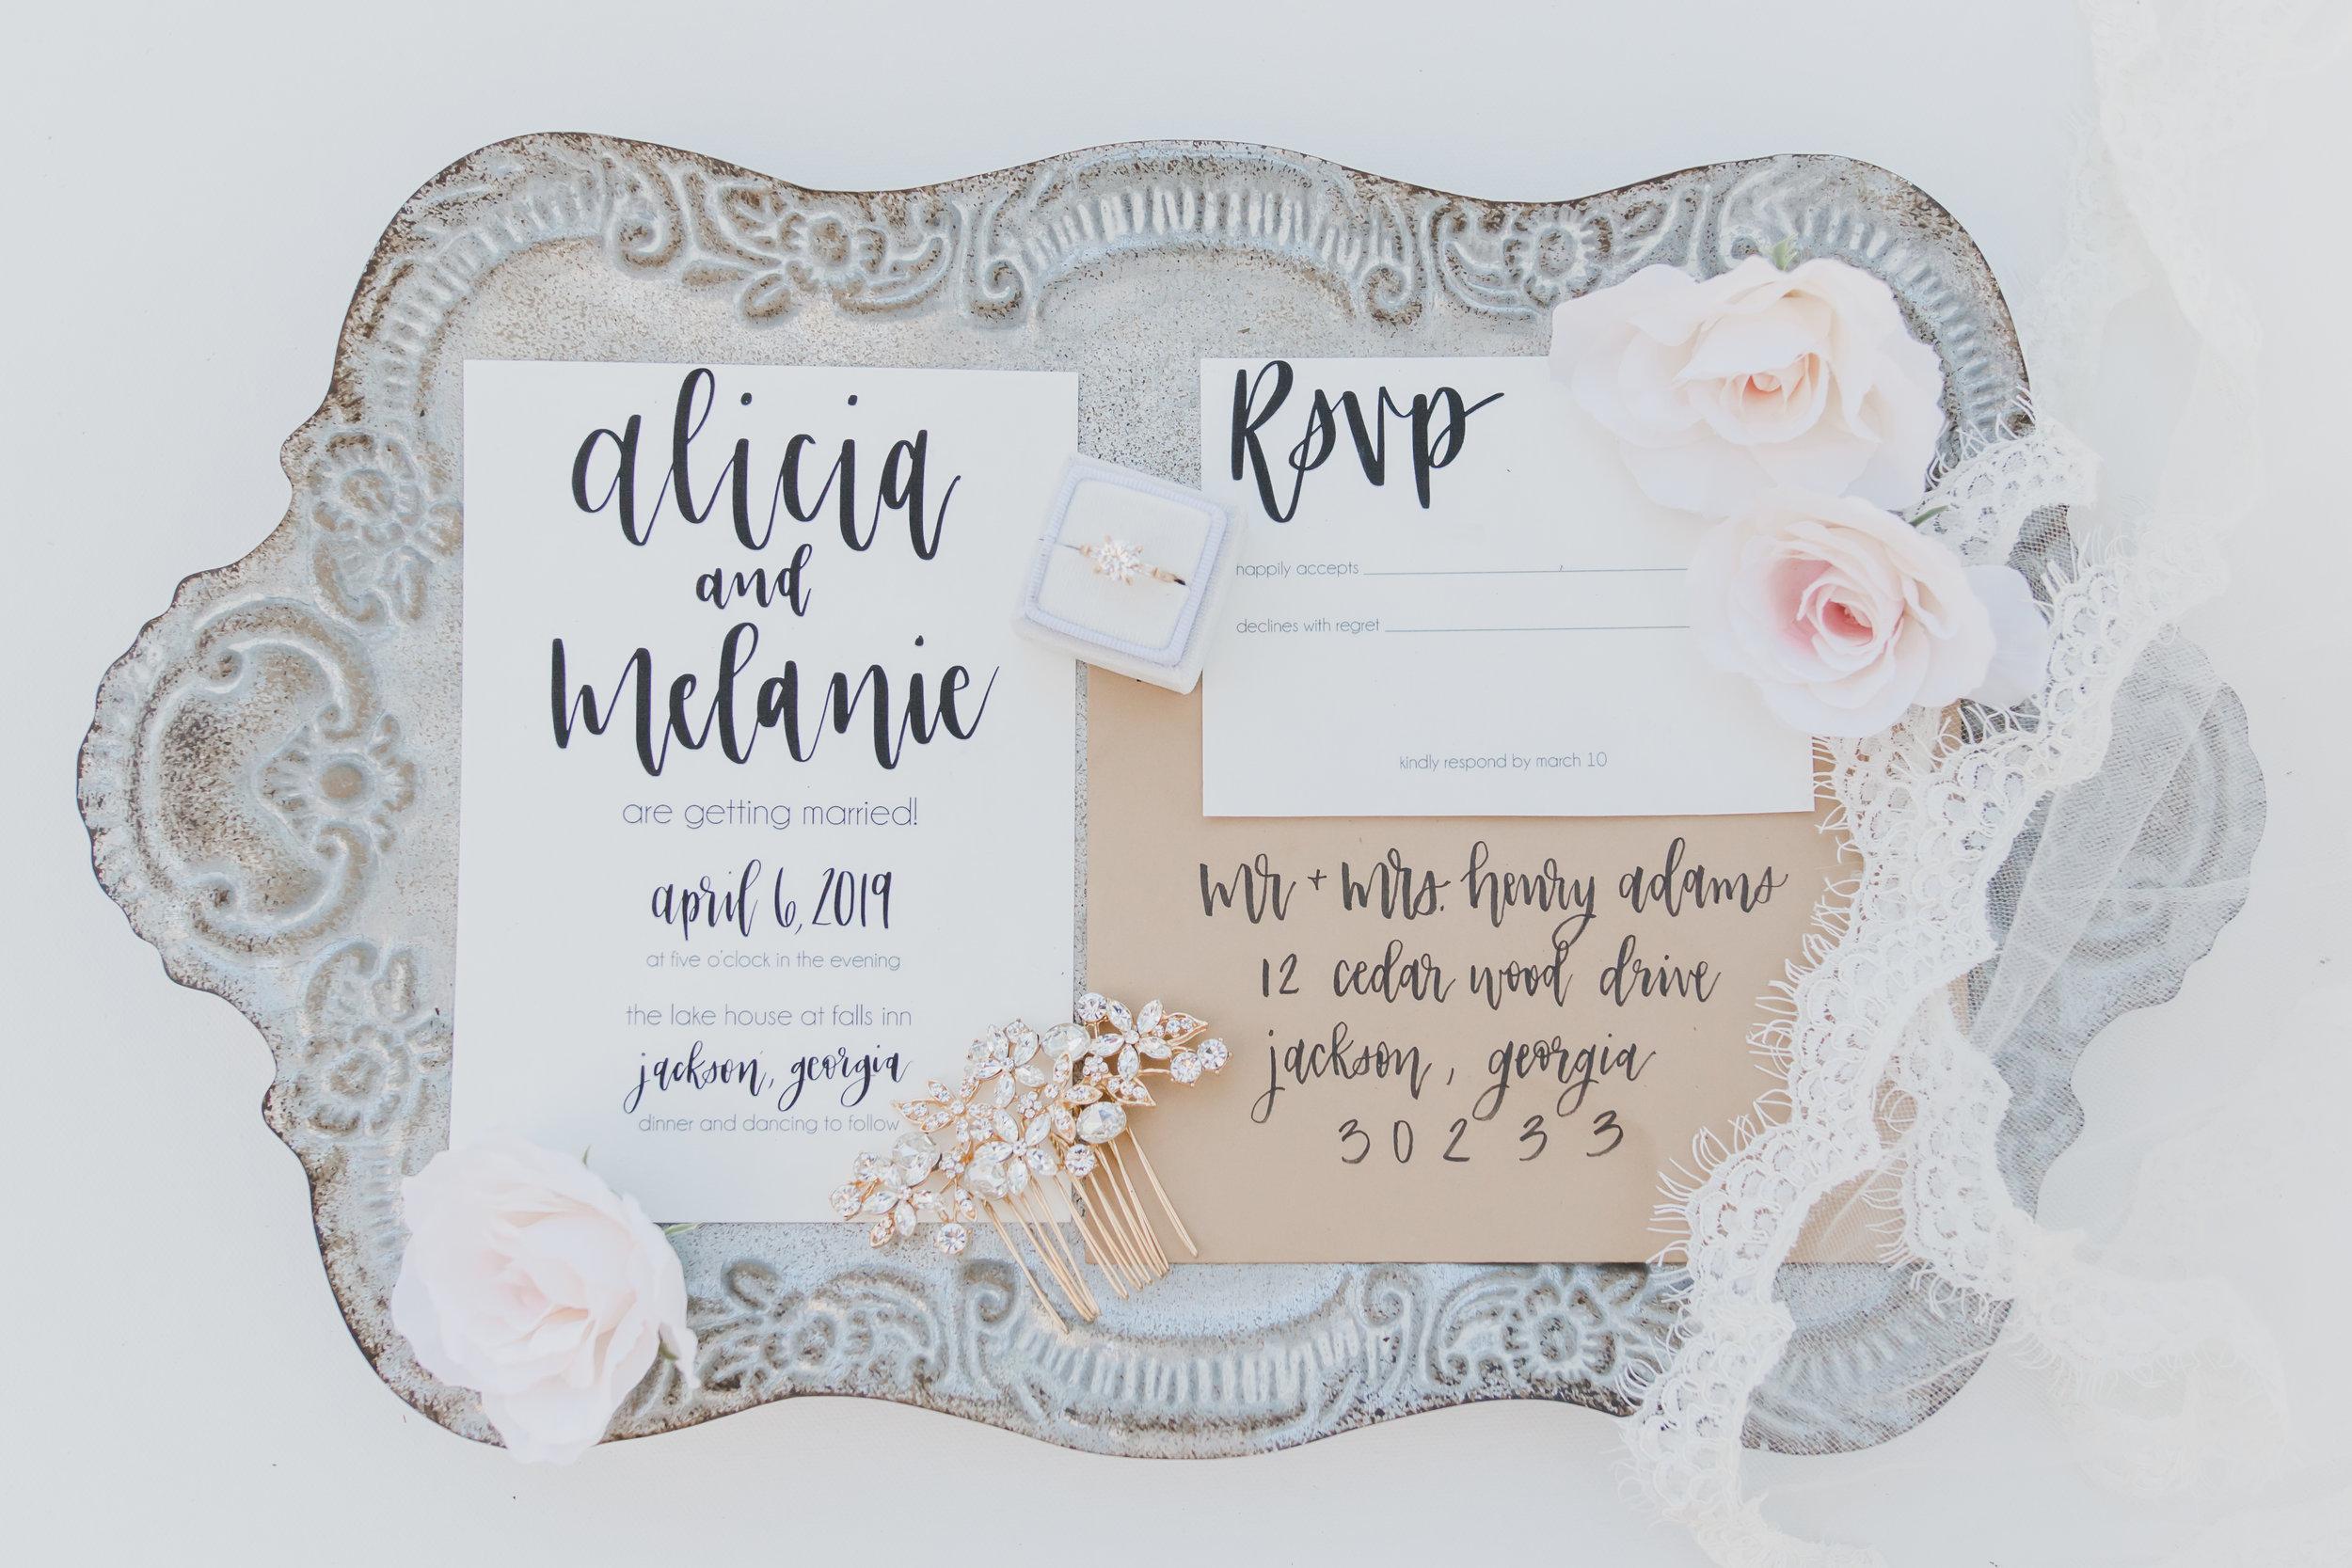 Venue:  @thelakehousehighfalls ⠀ Wedding Planner:  @jessicajevents ⠀ Photographer:  @leatherwoodportraits ⠀ Calligrapher:  @ecletters  ⠀ Flowers:  @funkymountainflowers ⠀ HMUA:  @bonniejeanbeauty ⠀ Rentals:  @atantapartyrentals ⠀ Models: @thesydneyporter  @florprodigiosa